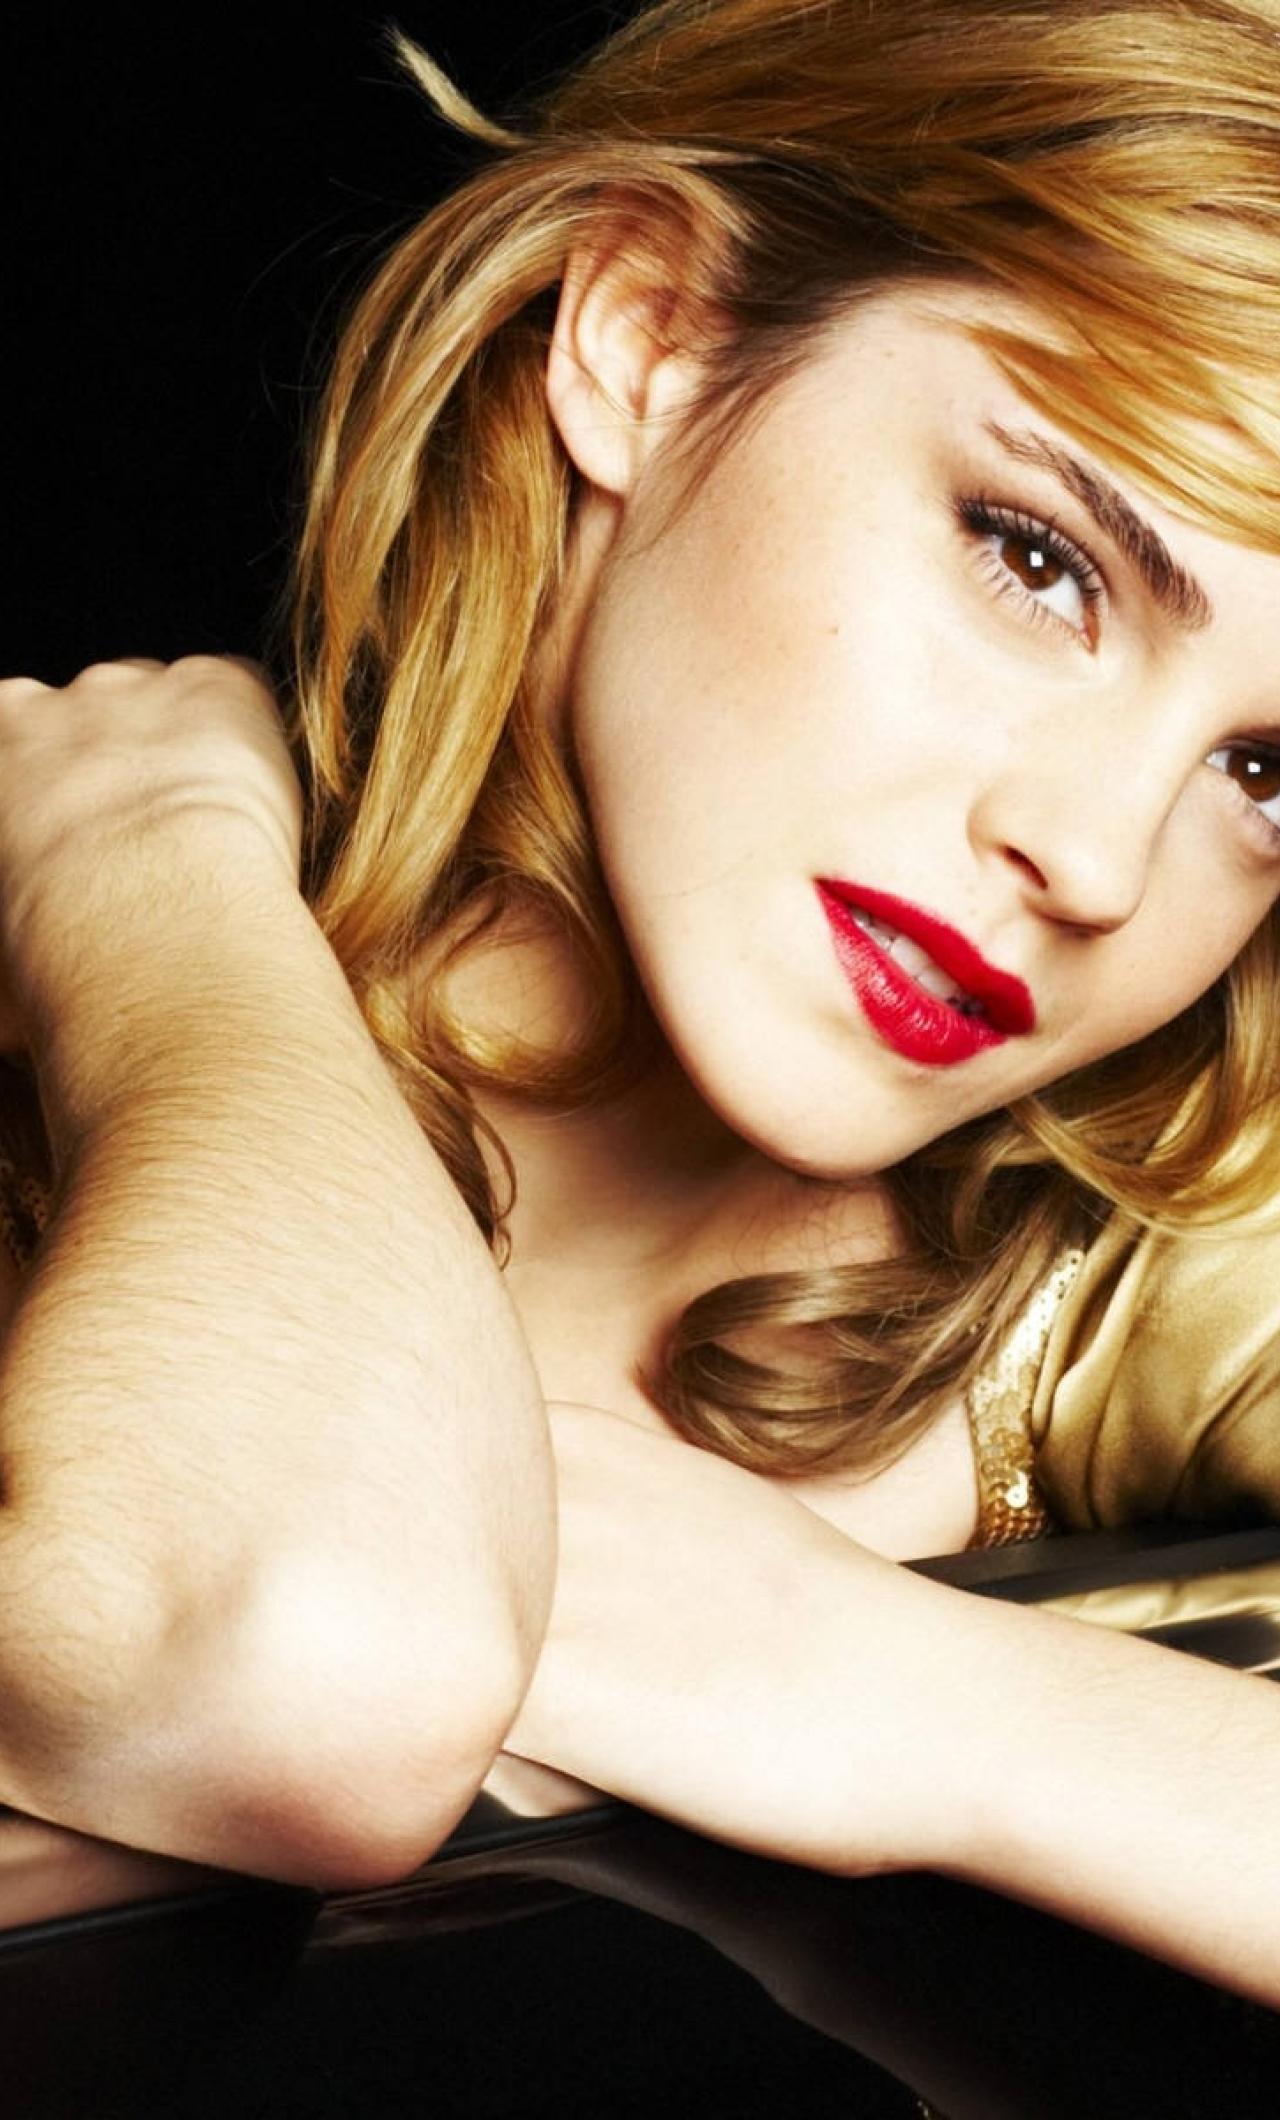 Download Emma Watson In Car Photoshoot 1280x2120 Resolution Full